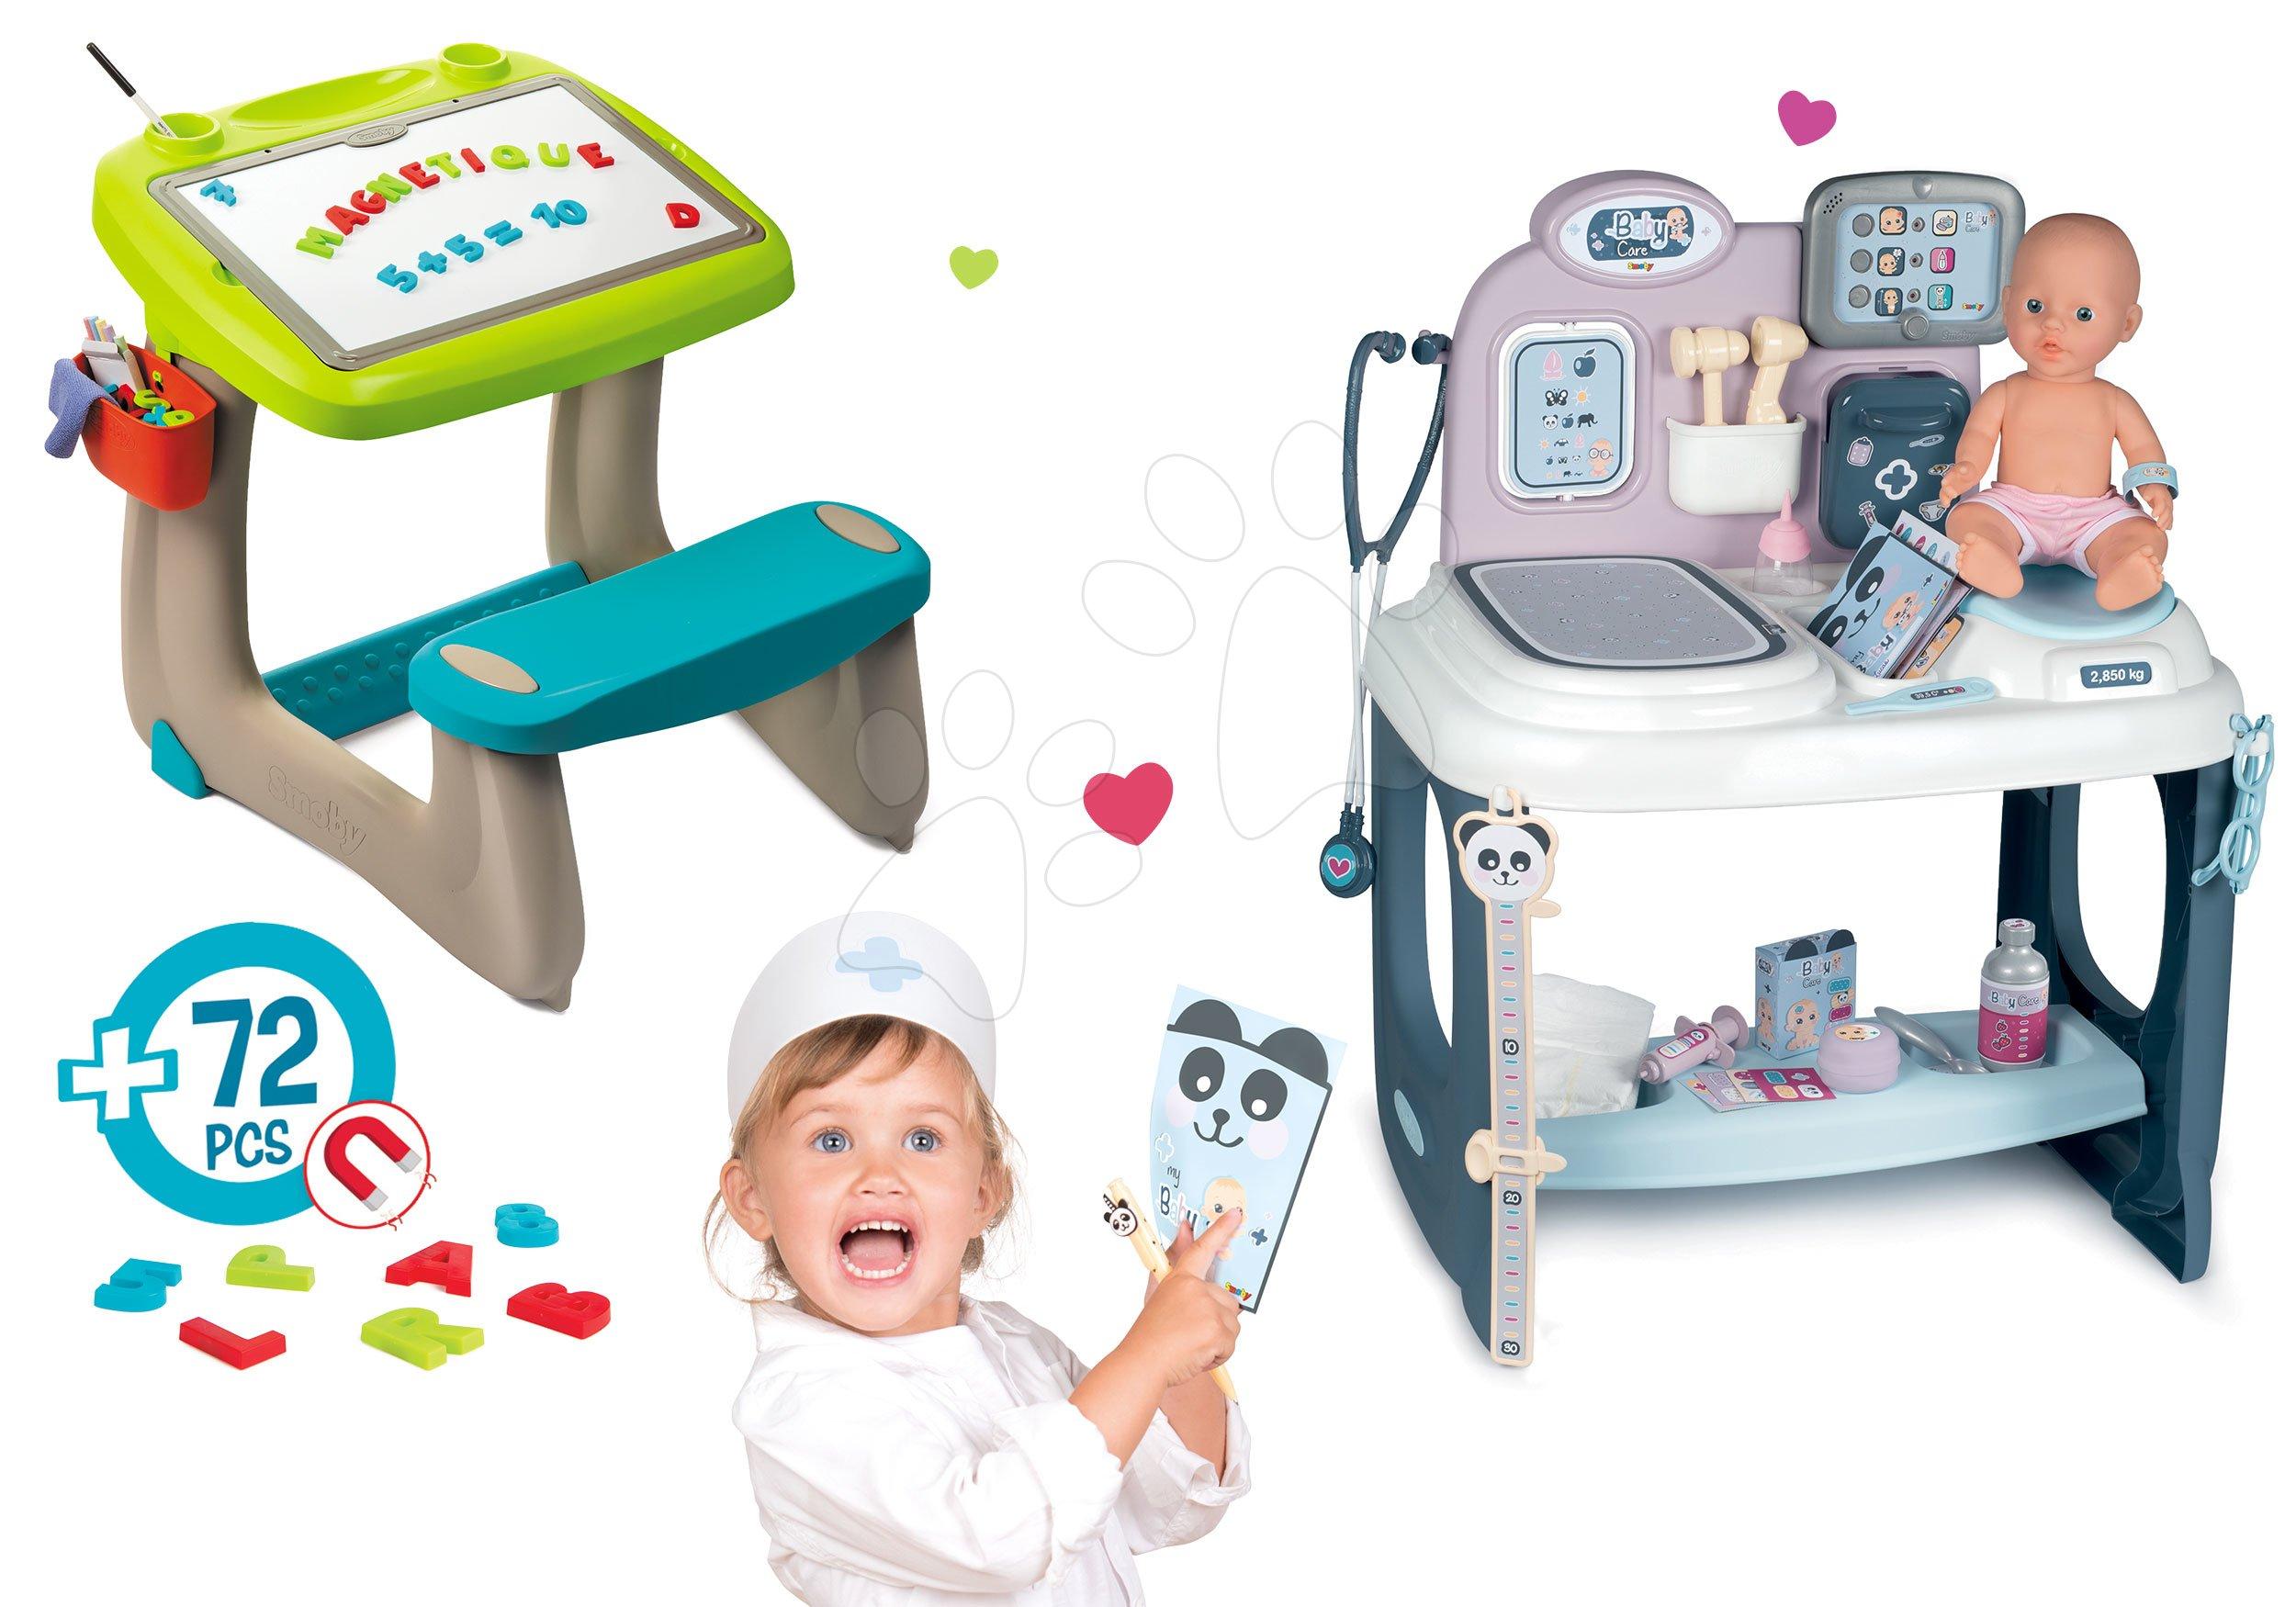 Smoby set detská lavica s odkladacím priestorom a obojstrannou tabuľou Activity a magnetky 420102-6